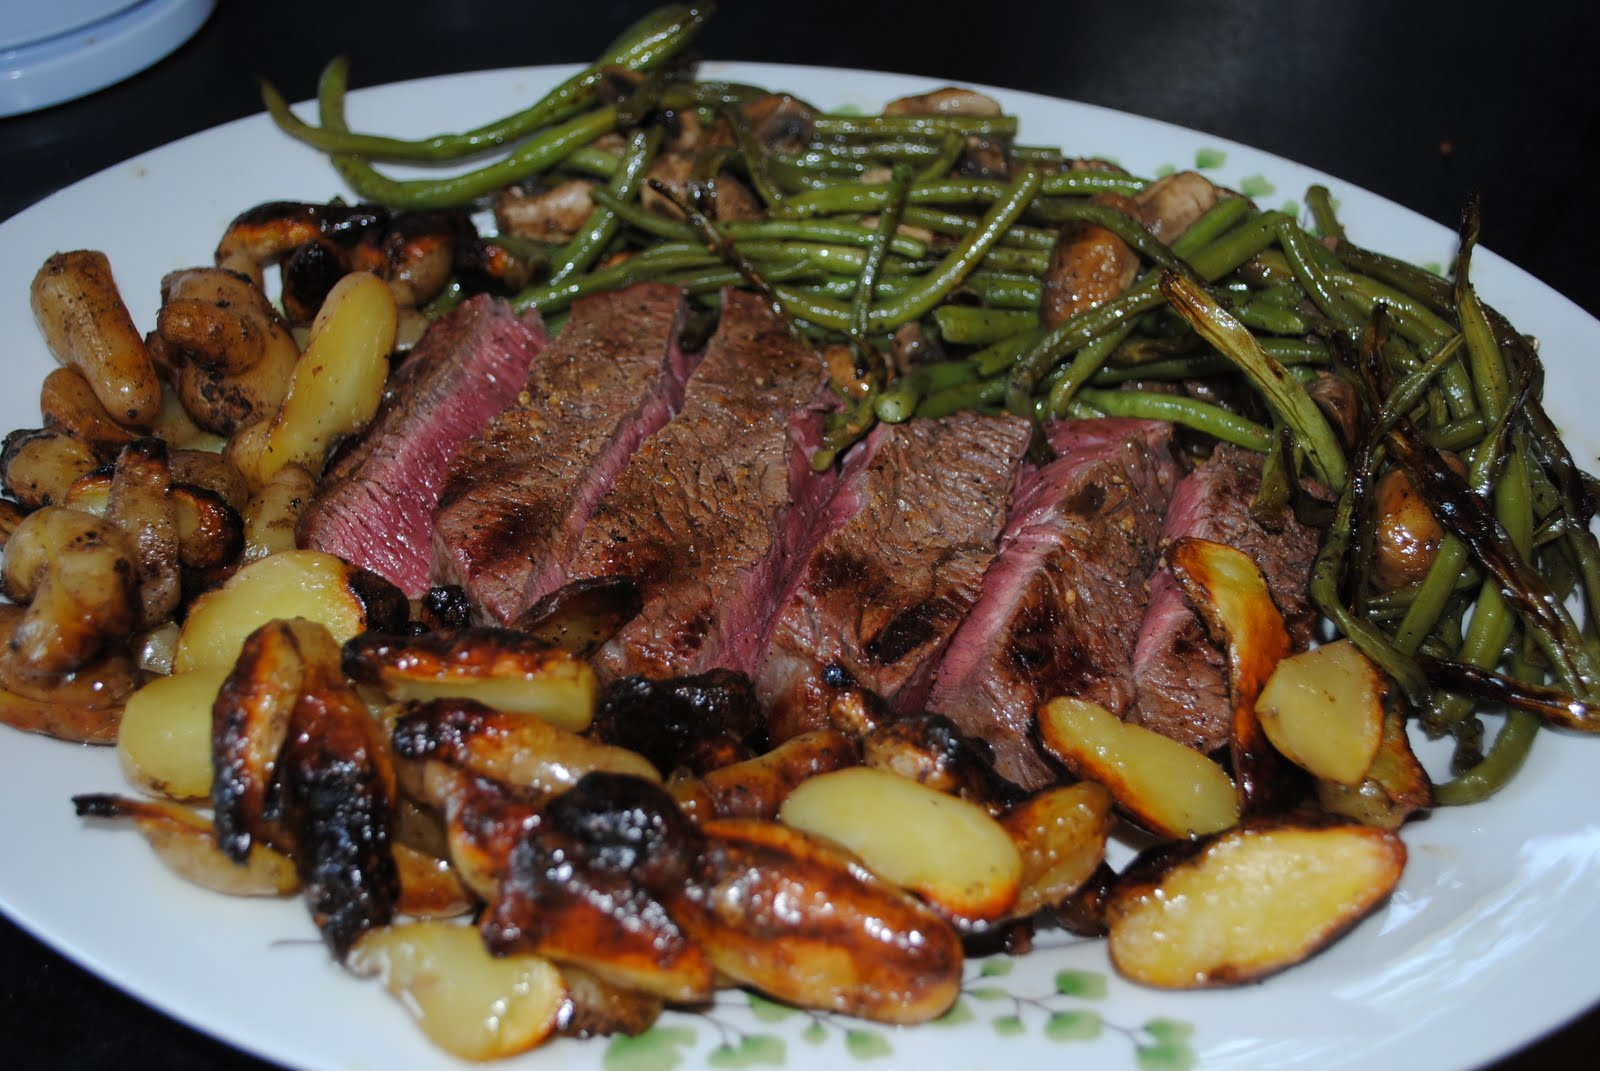 steak and potatoes and corn